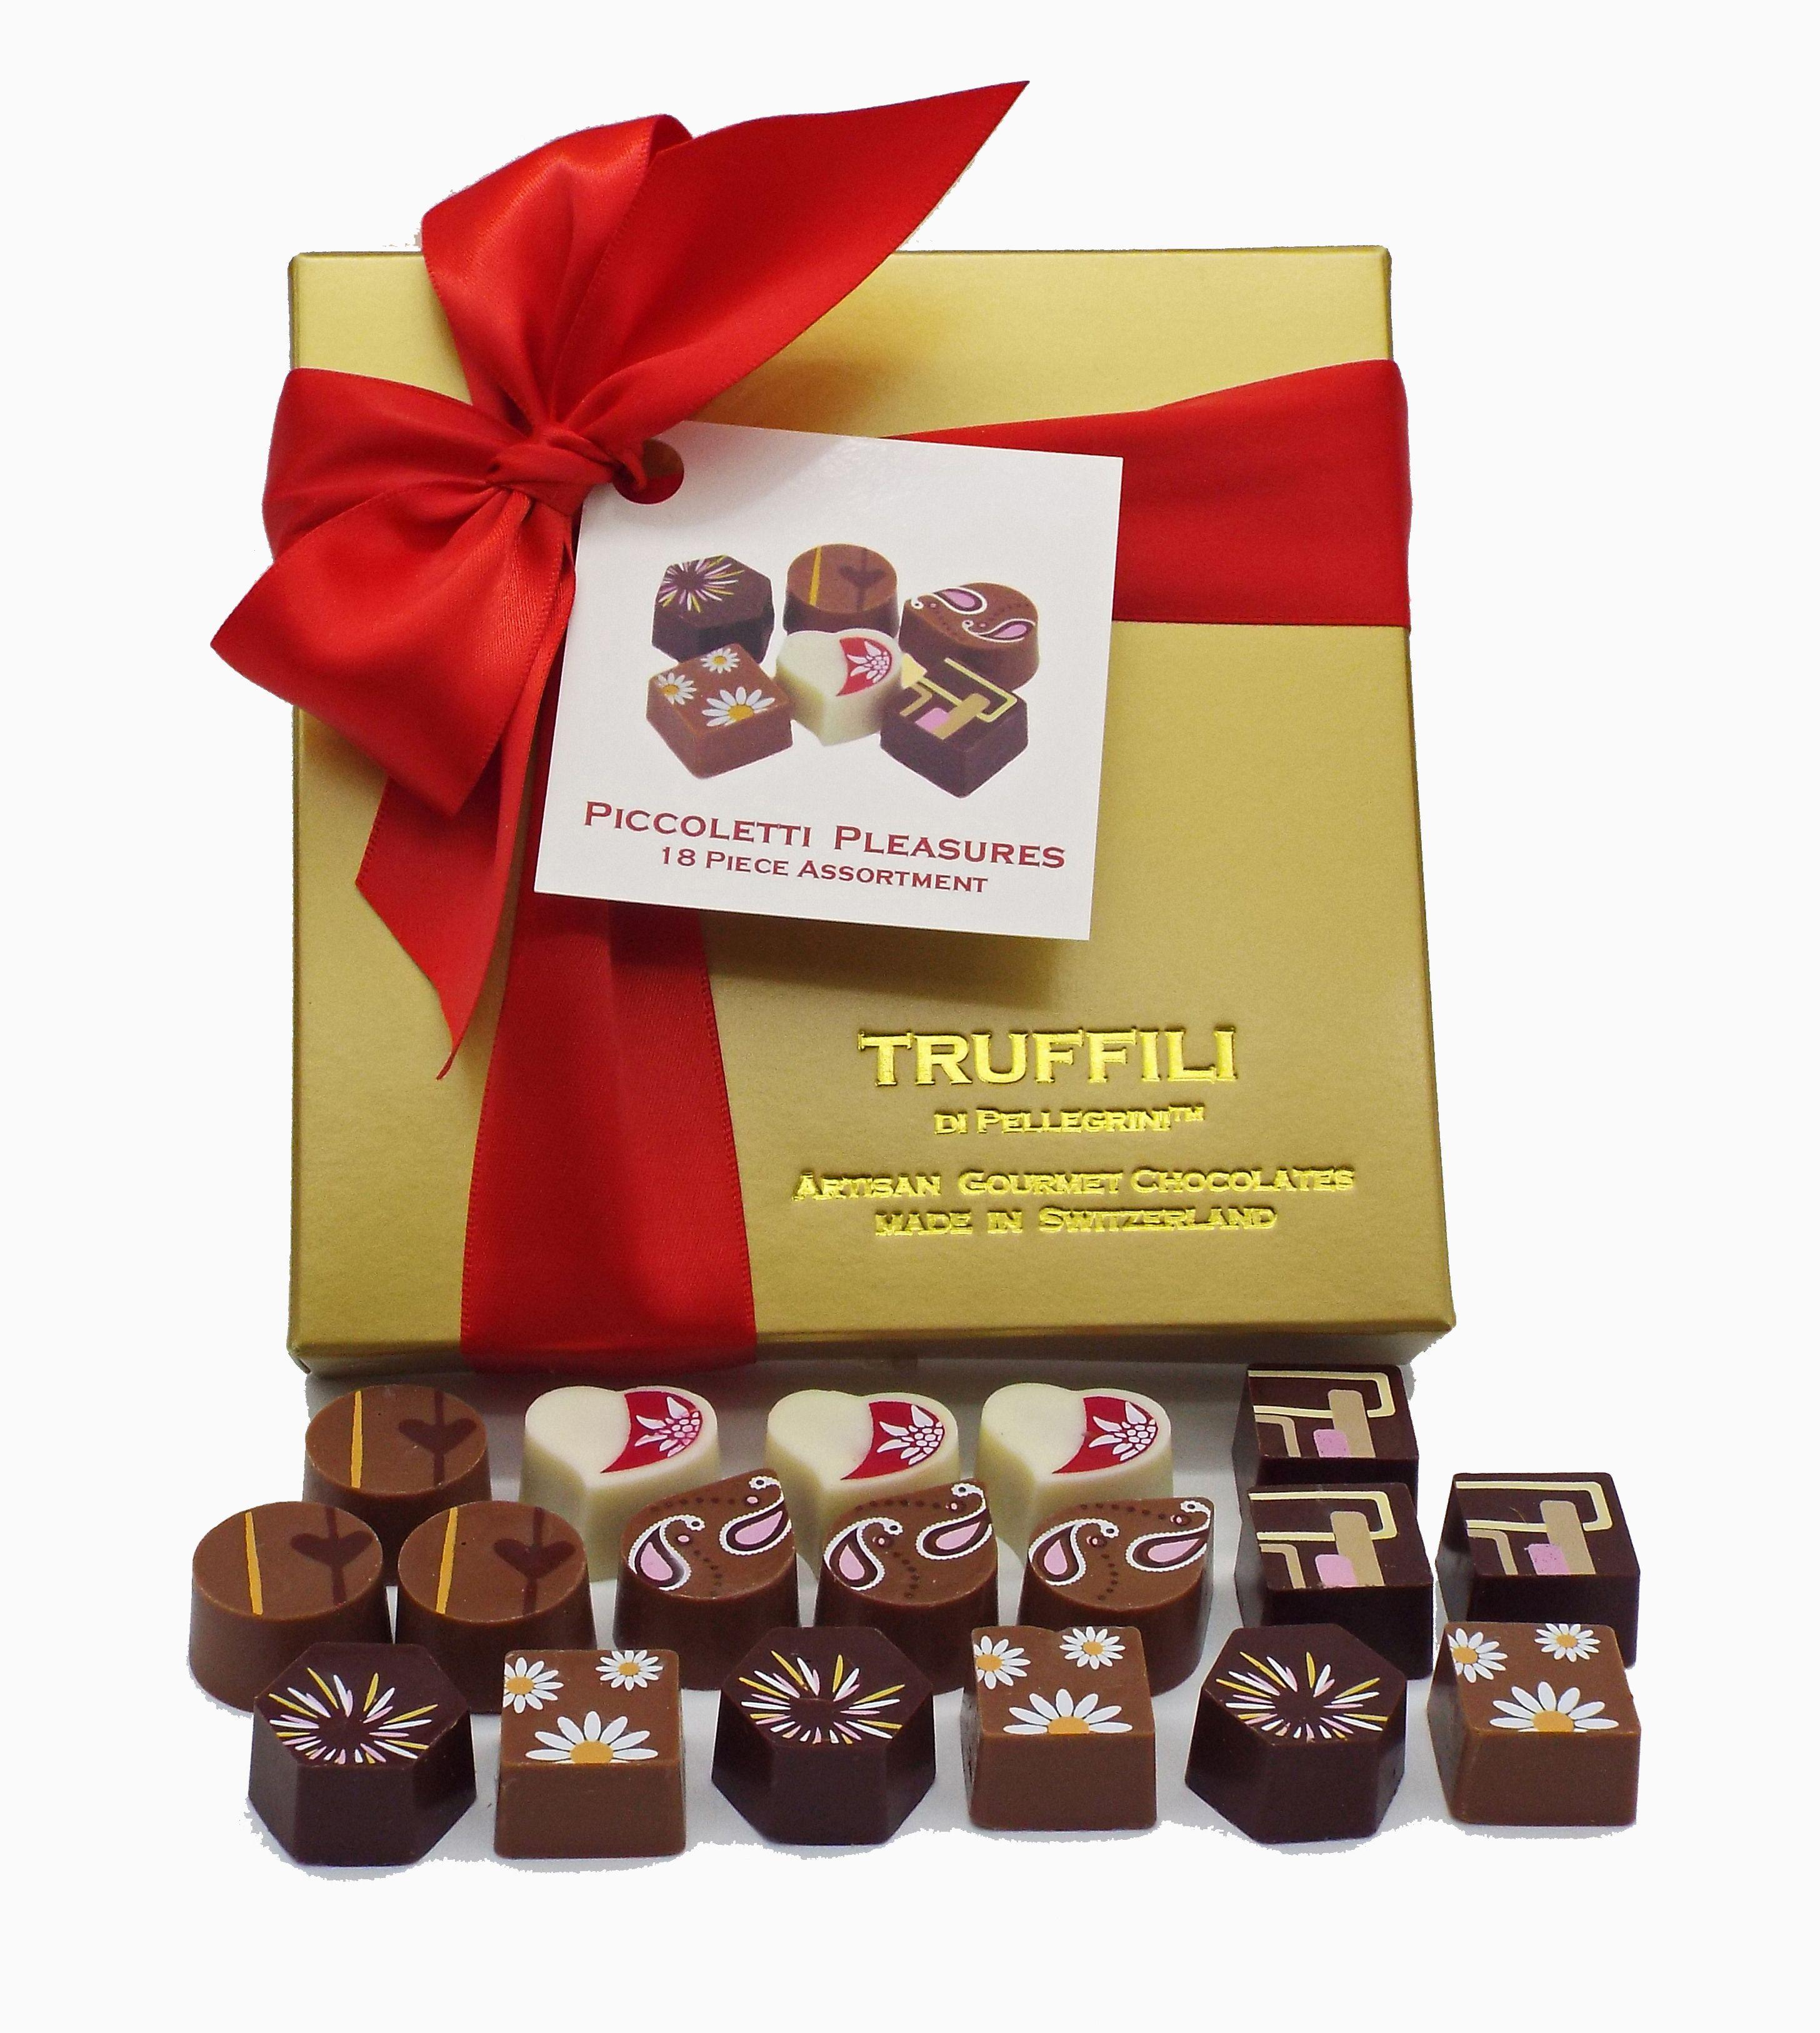 Truffili Chocolates Artisan Gourmet Chocolate Made In Switzerland European Confections Chocolates And Truf Gourmet Chocolate How To Make Chocolate Truffles